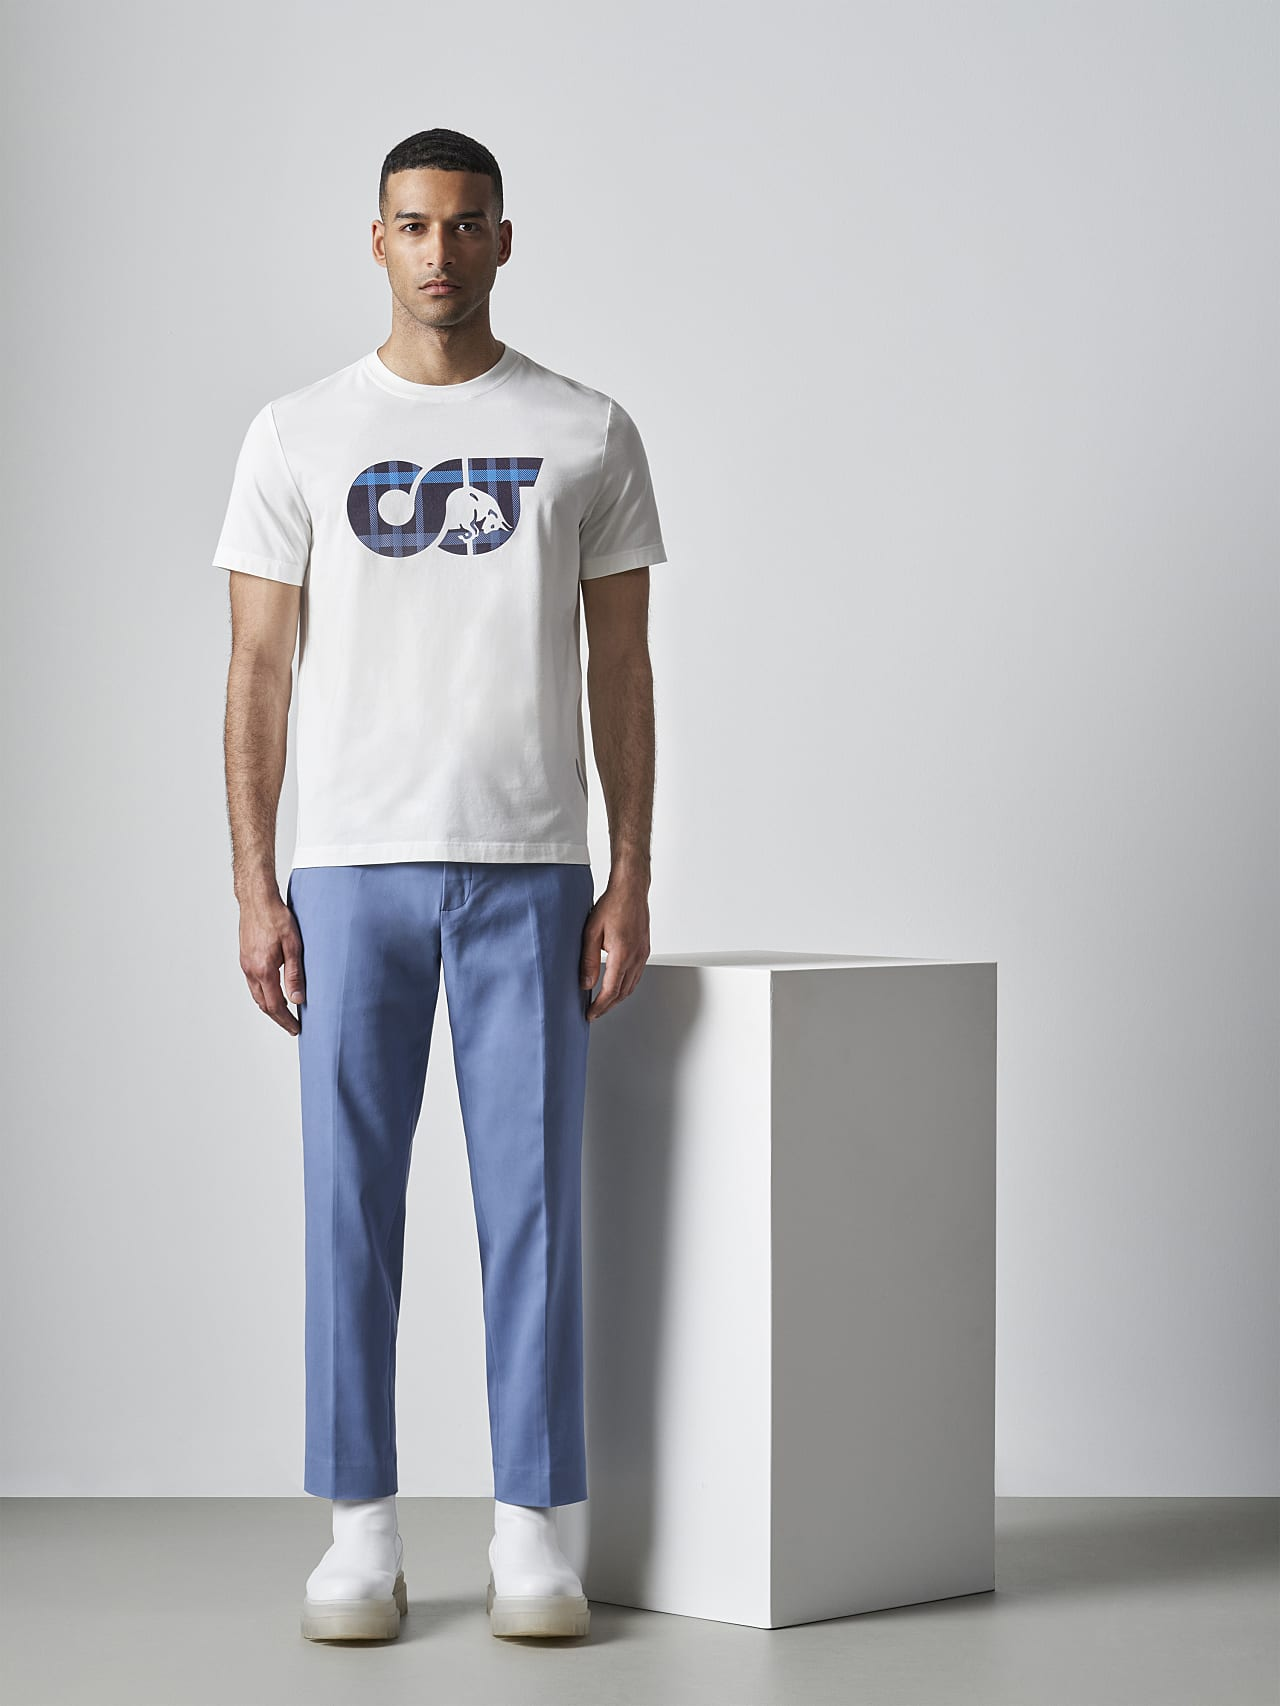 JABIS V1.Y5.02 Logo Print T-Shirt offwhite Front Alpha Tauri